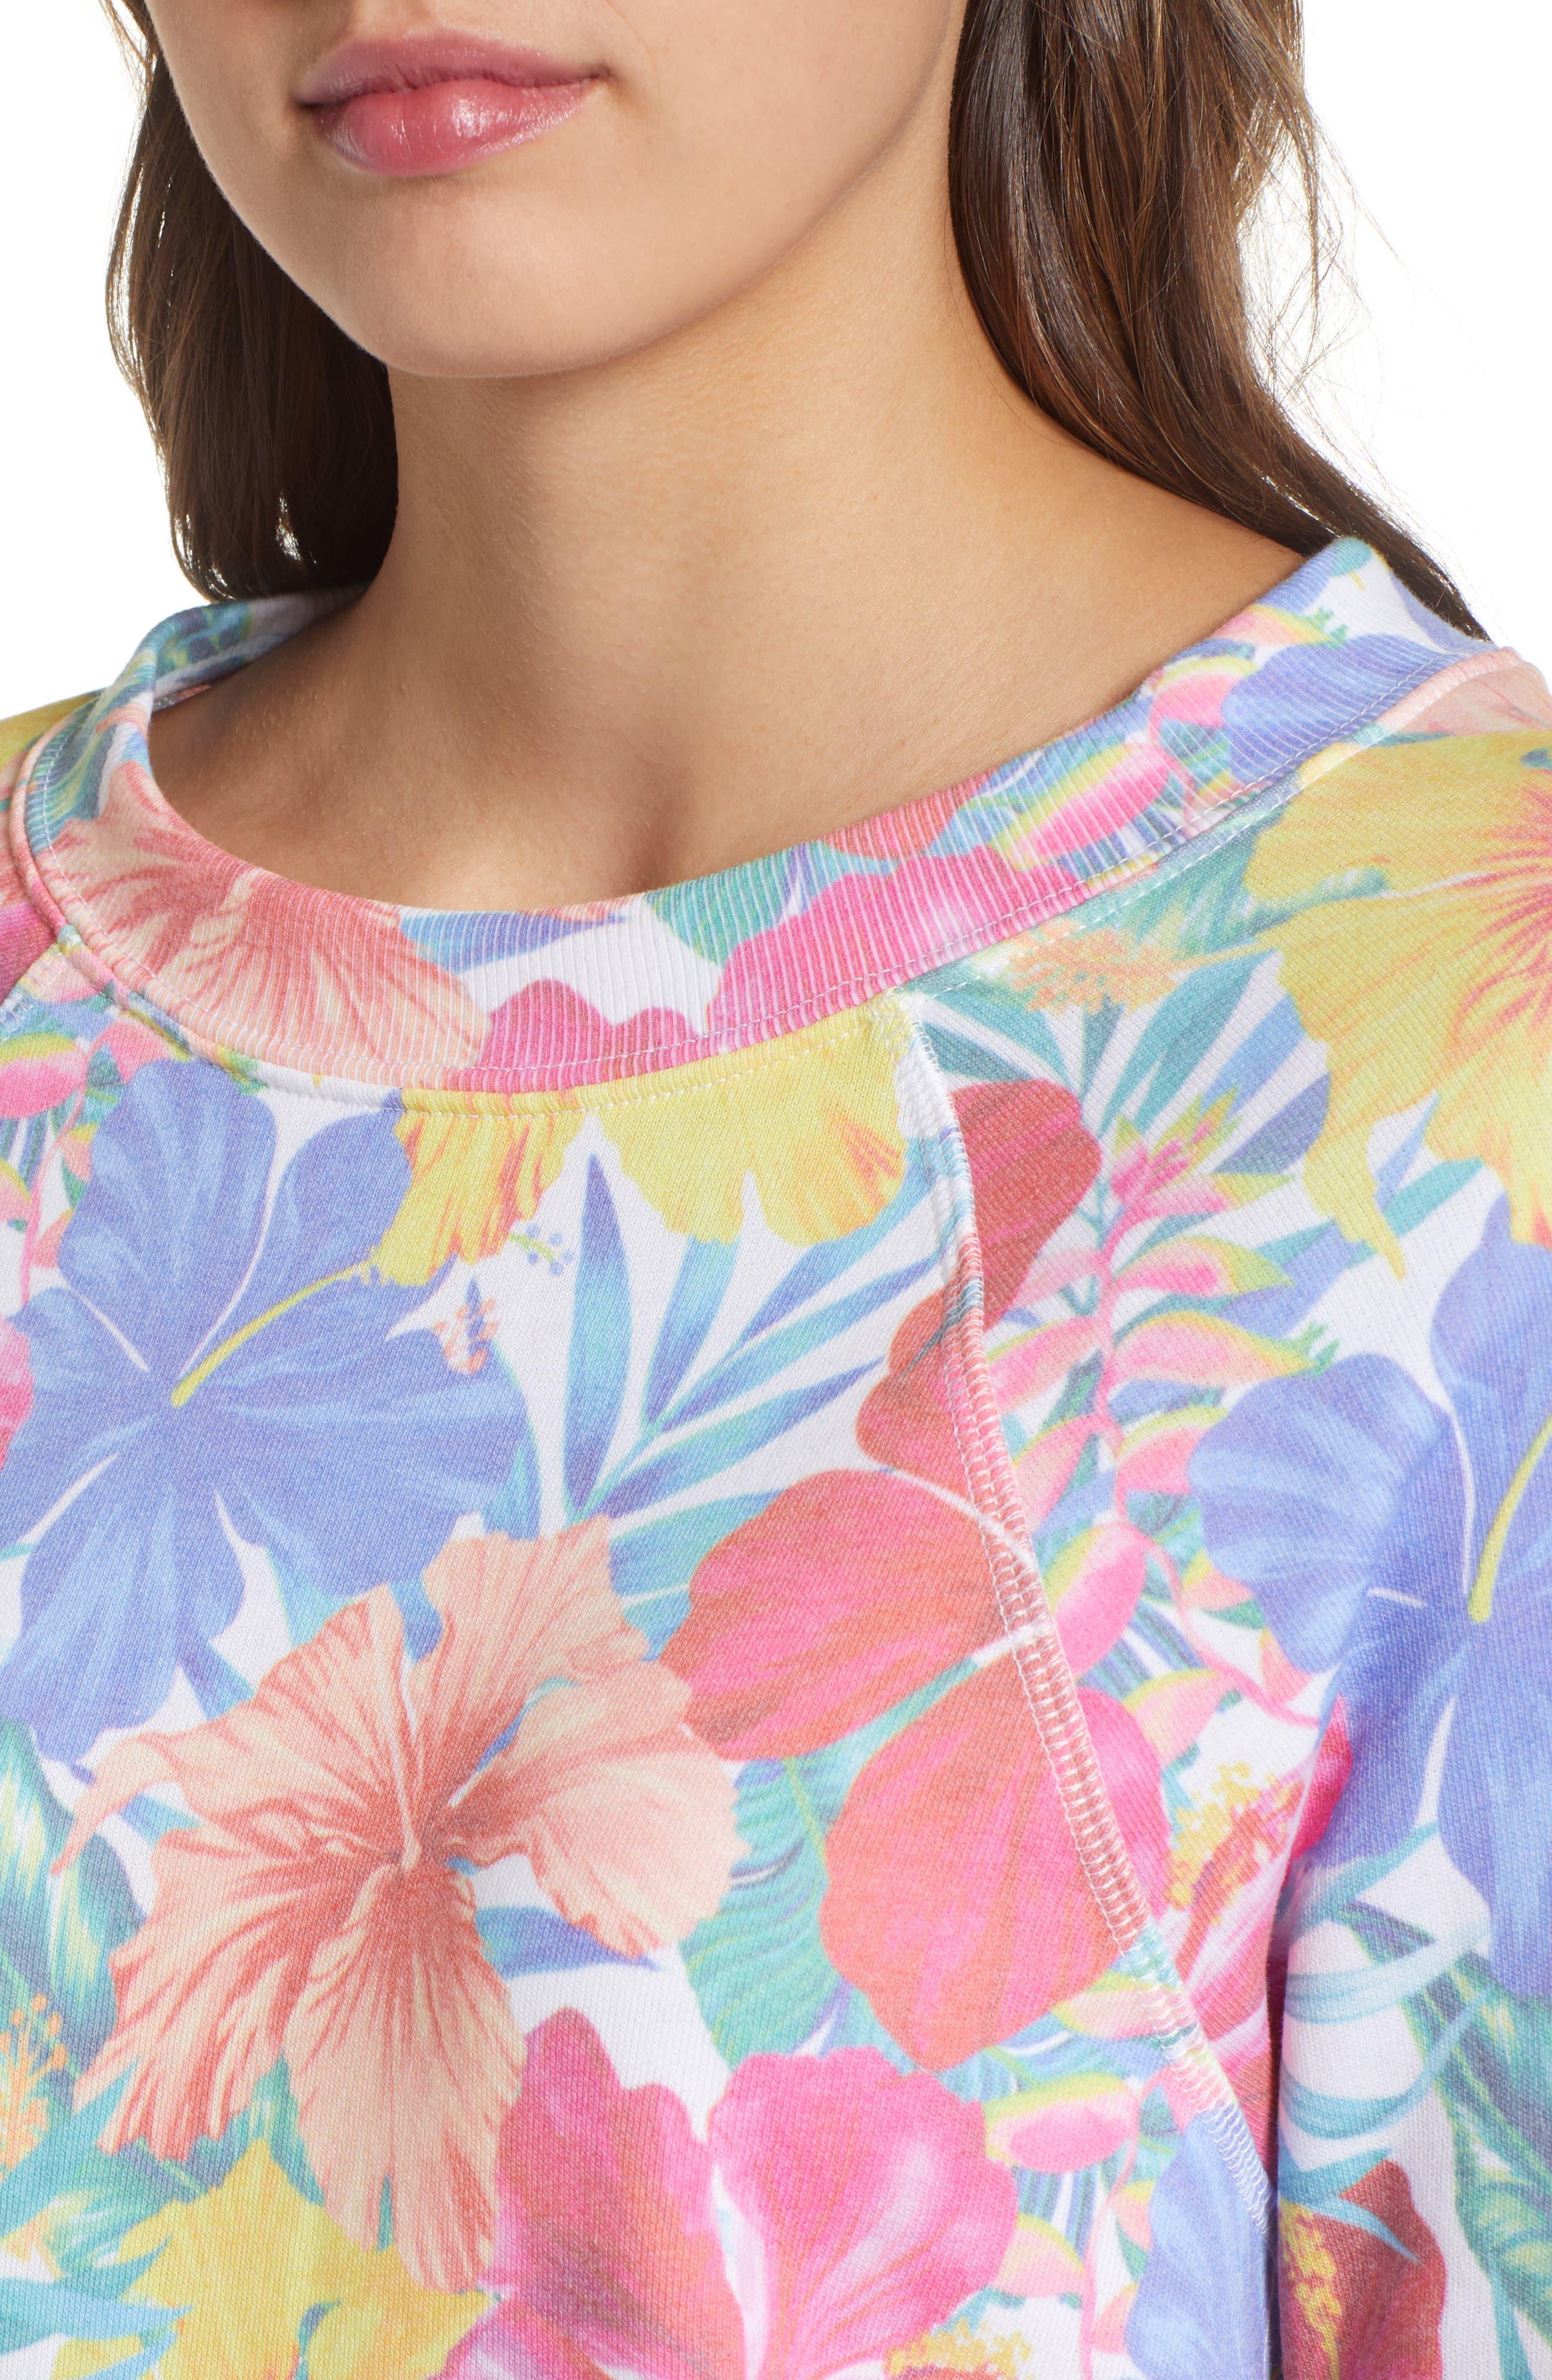 Tropicalia Sommers Sweatshirt,                             Alternate thumbnail 4, color,                             Multi Colored